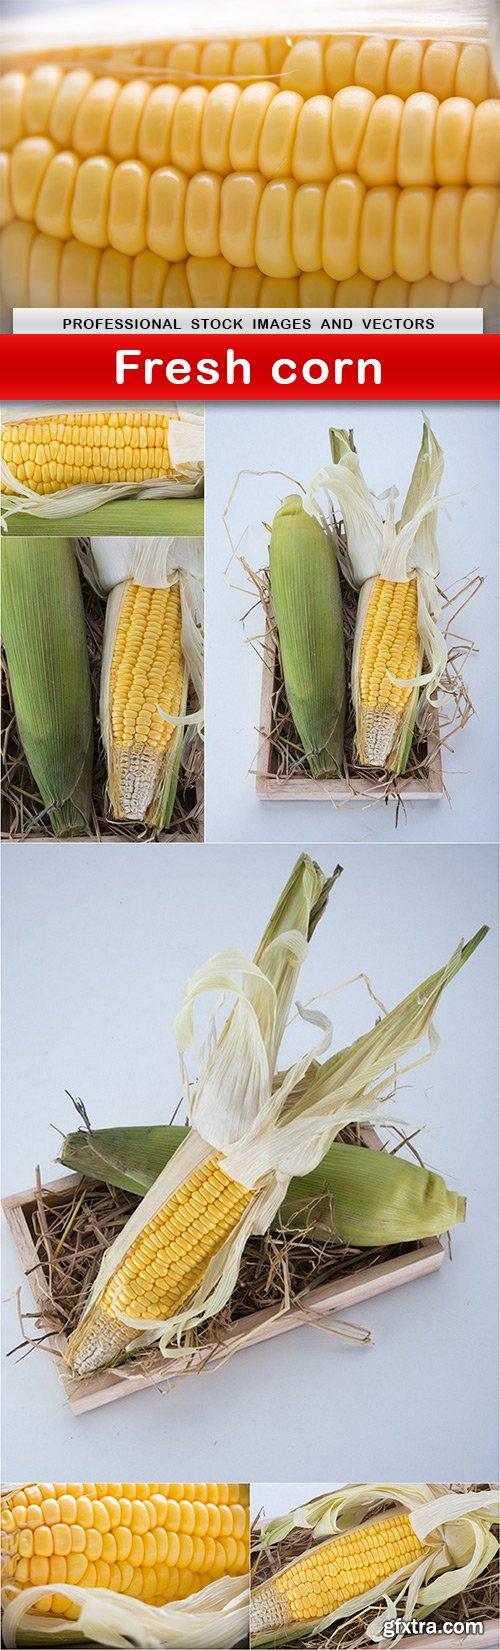 Fresh corn - 7 UHQ JPEG